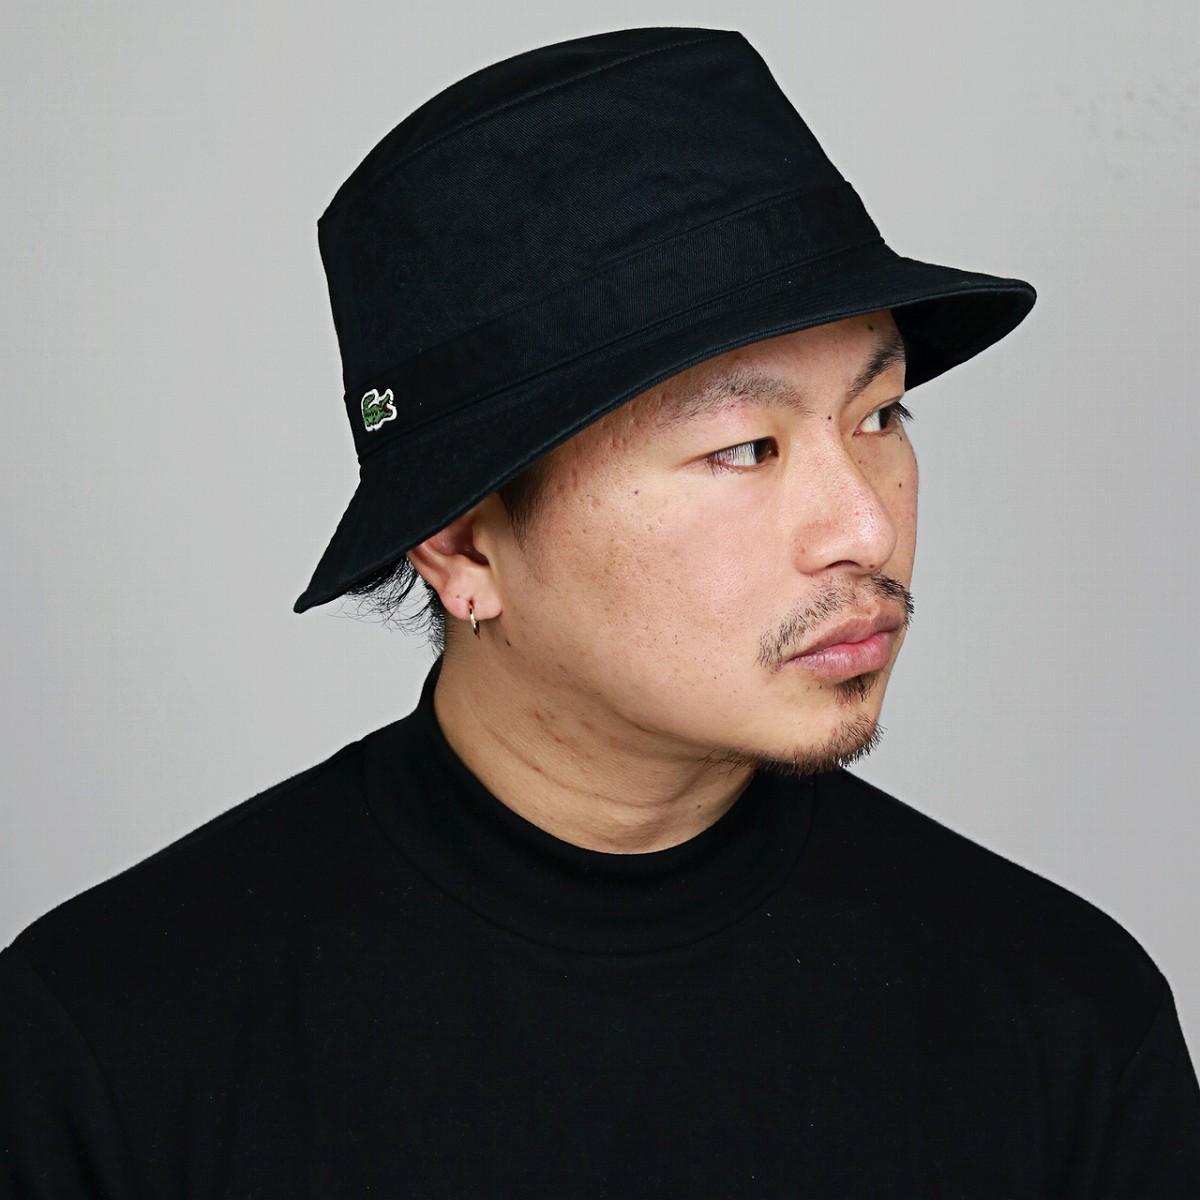 ce4f1fa2fdf955 ELEHELM HAT STORE: LACOSTE bucket Hat Lacoste Hat Safari Hat Black ...